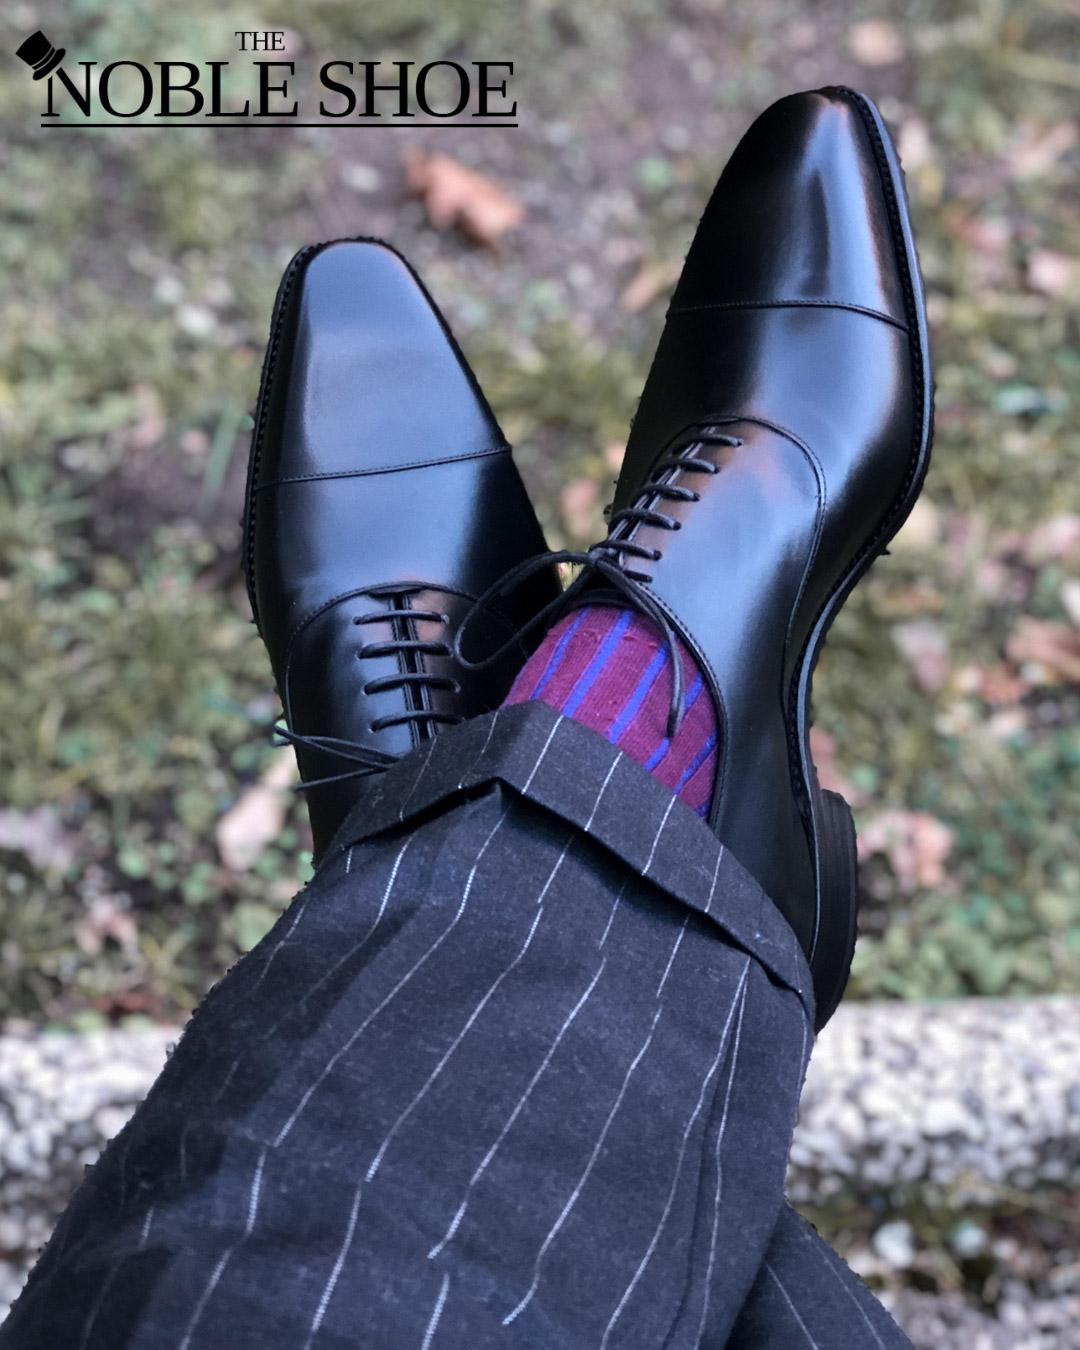 Carlos Santos Black Oxfords for the noble shoe